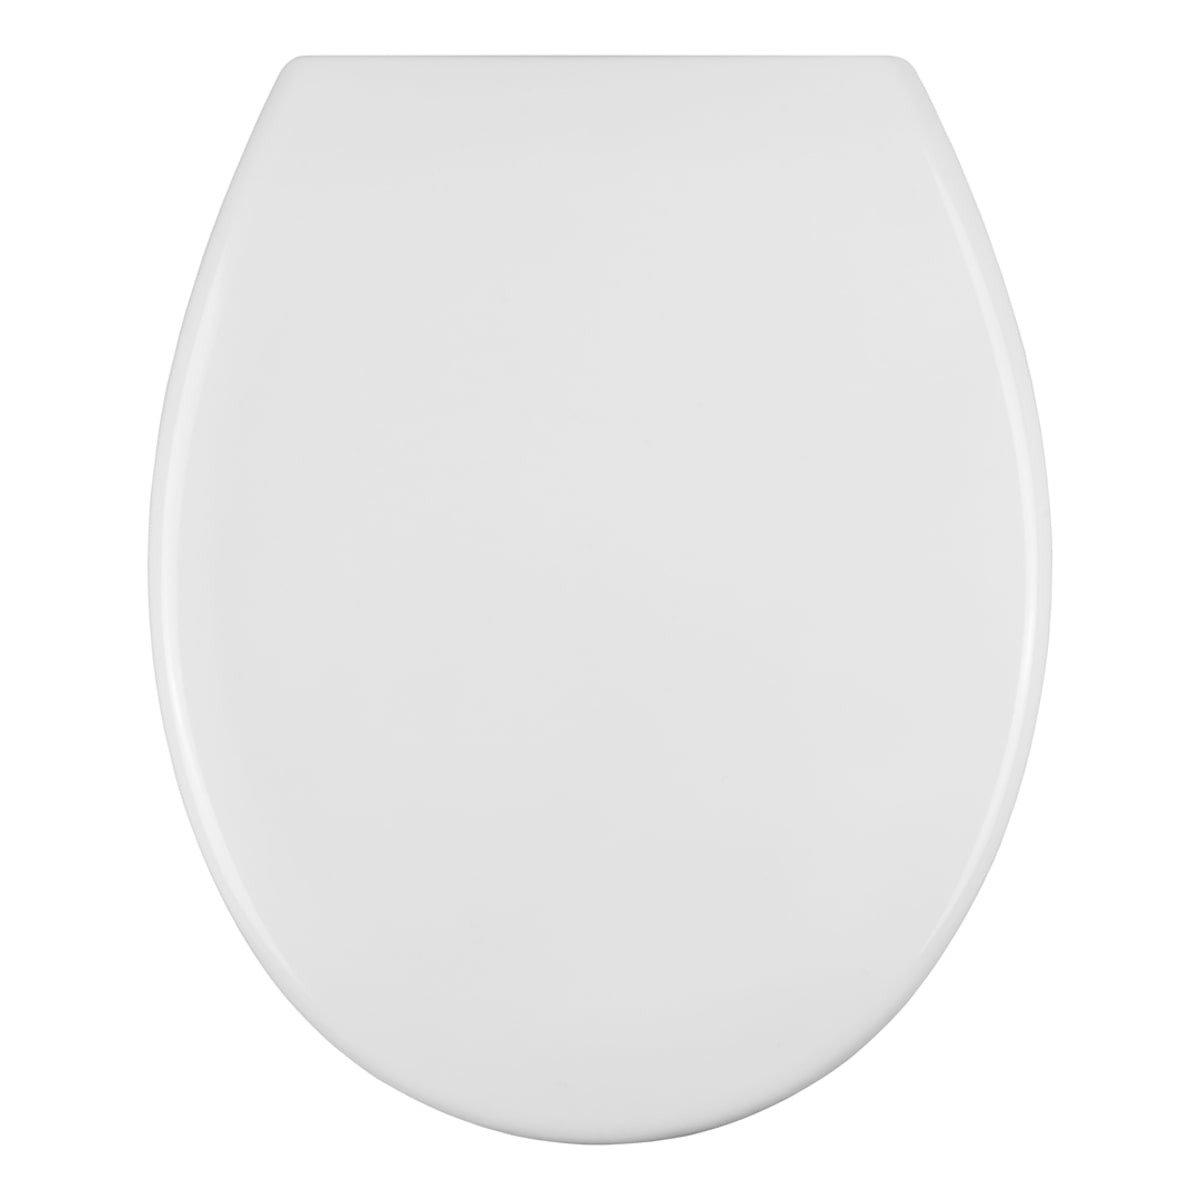 Univerzálne mäkké toaletné sedadlo Corsan DS-01S